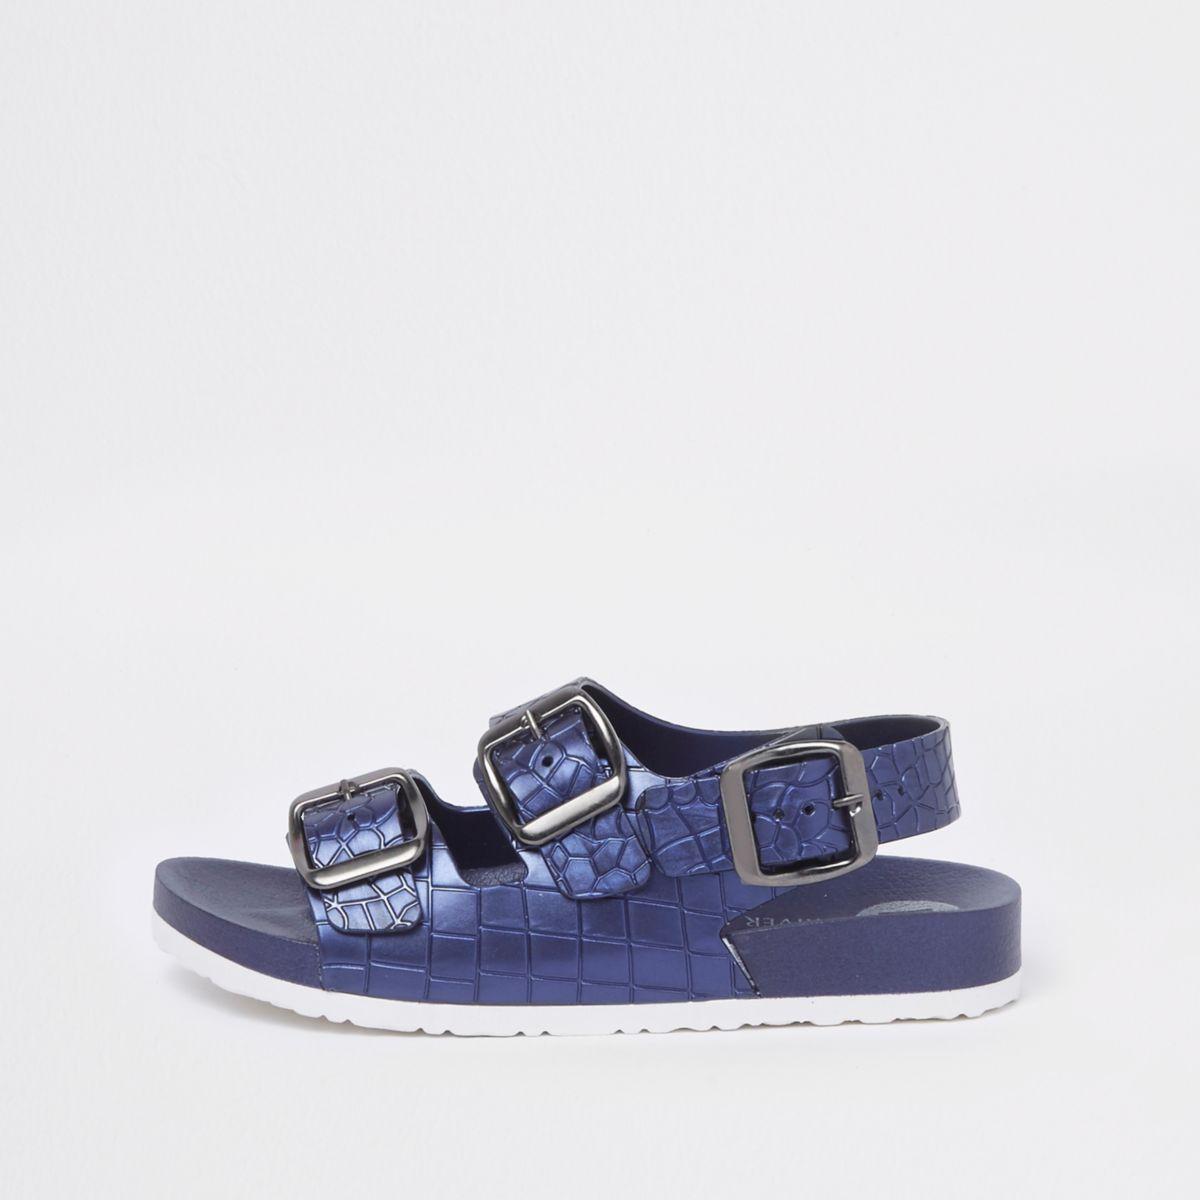 Boys navy croc buckle sandals